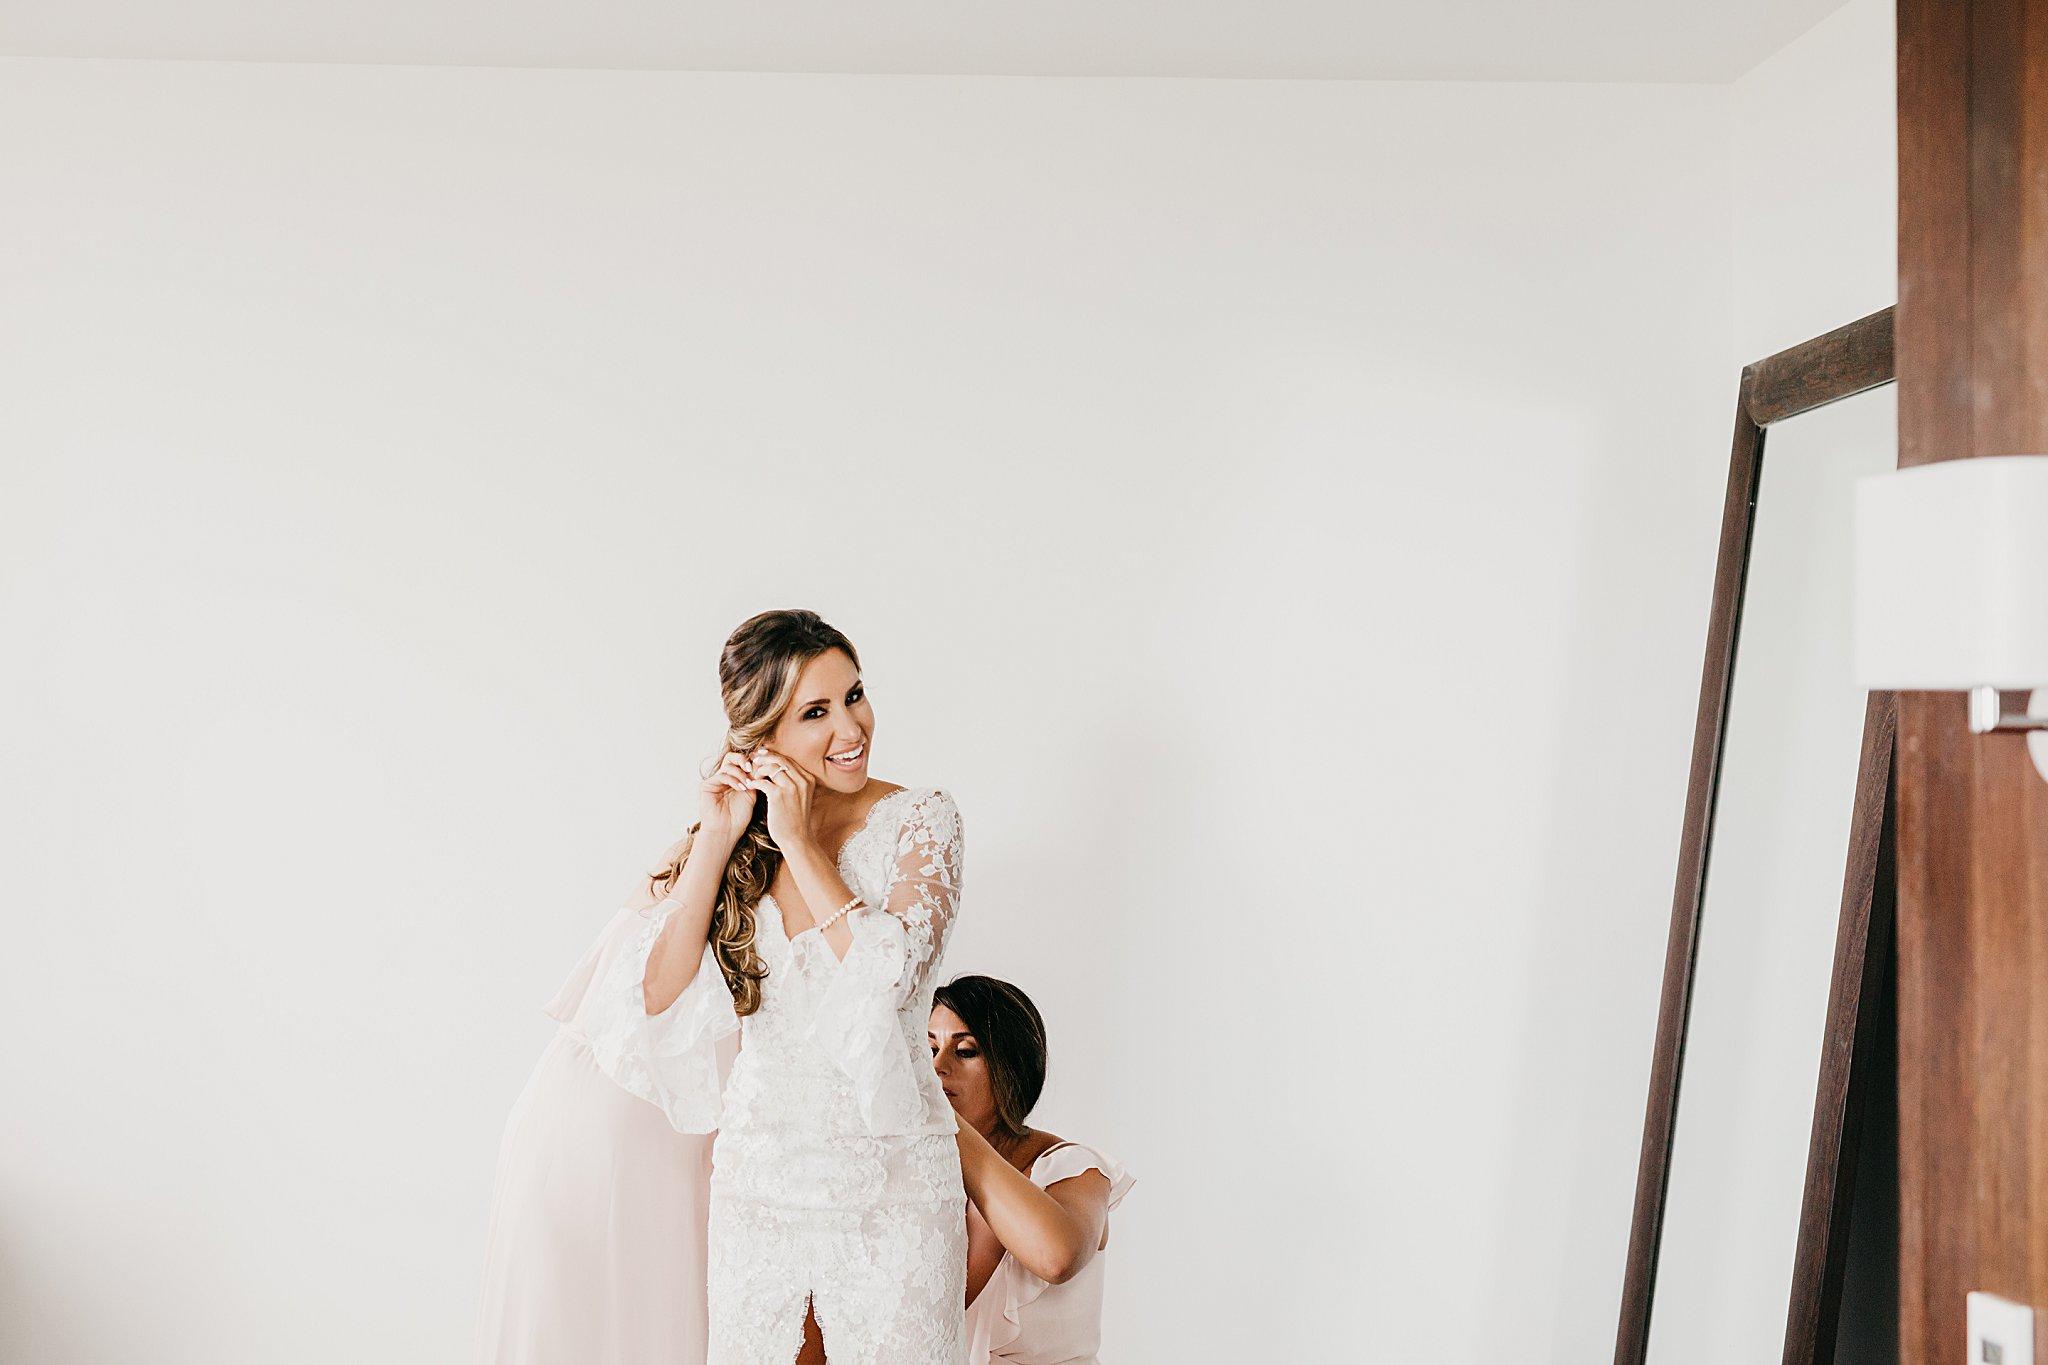 JessicaBordnerPhotography_5710.jpg